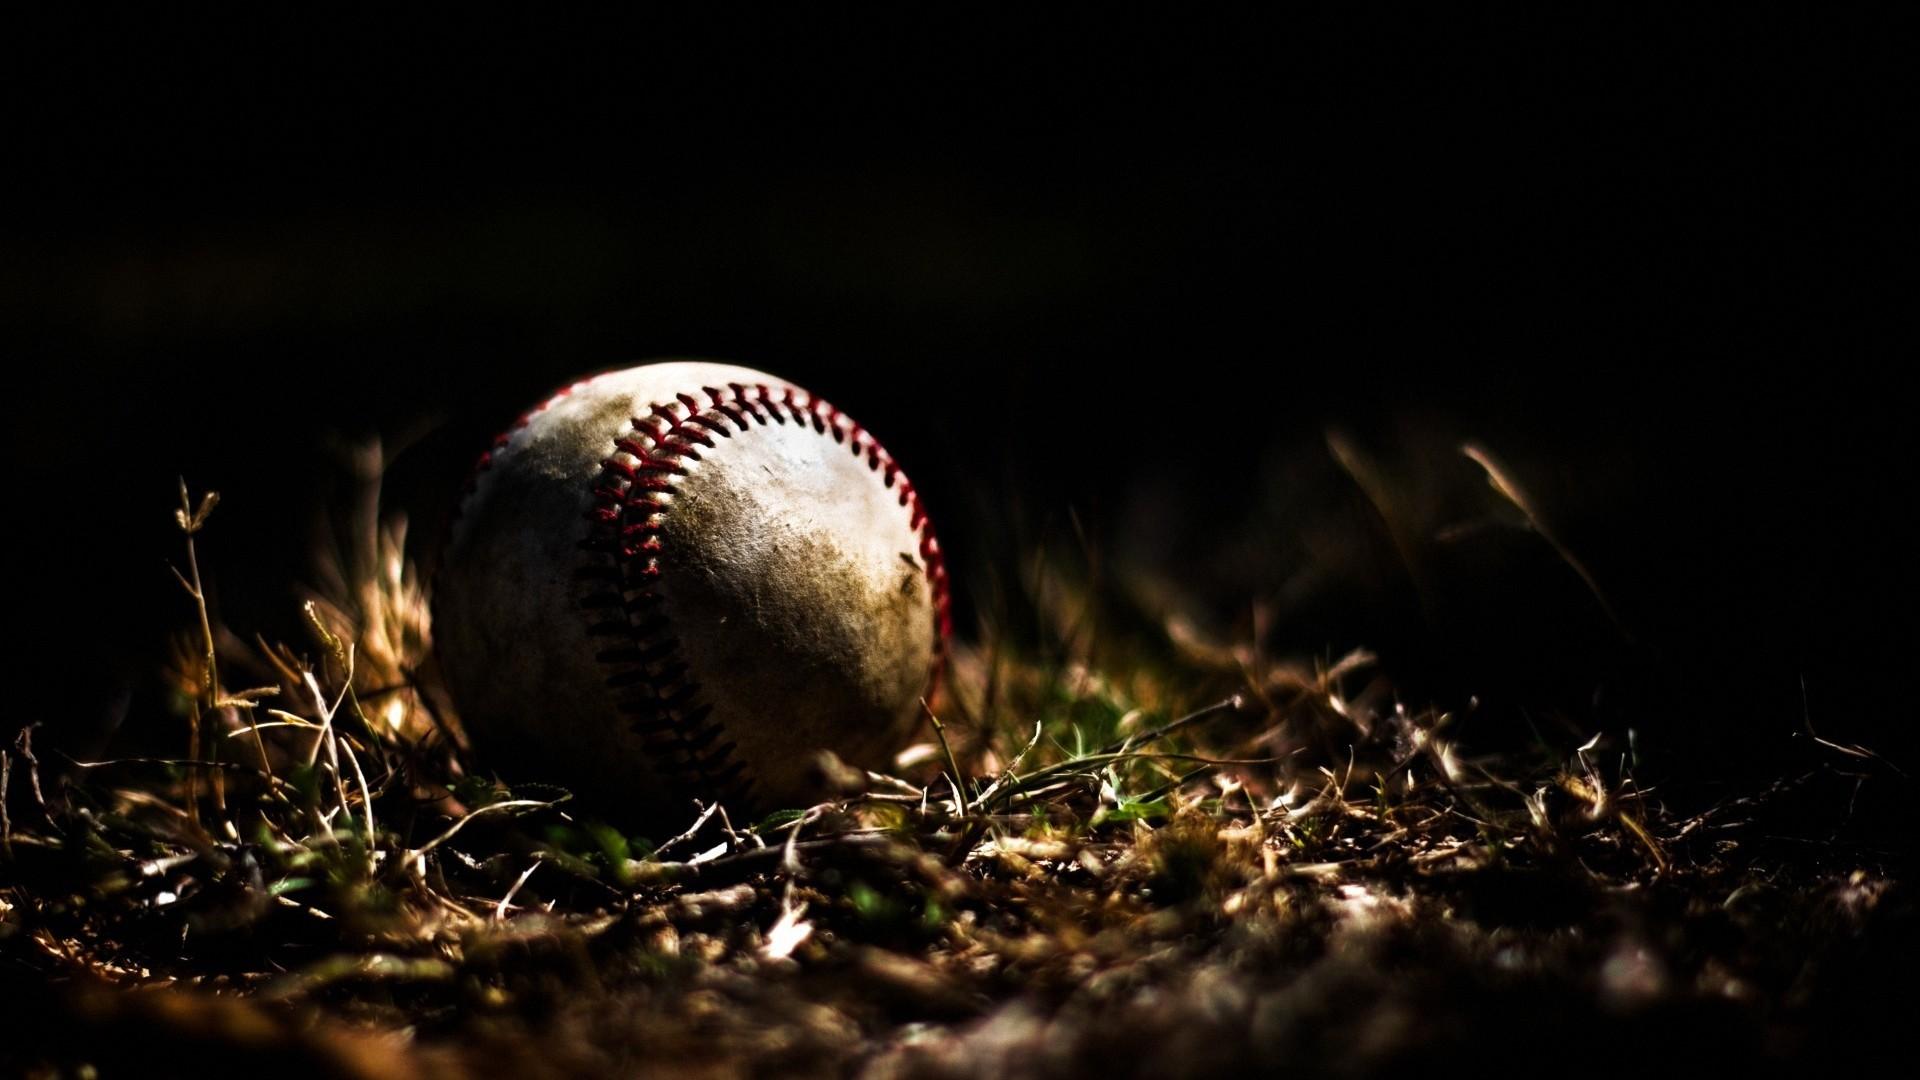 Softball High Quality